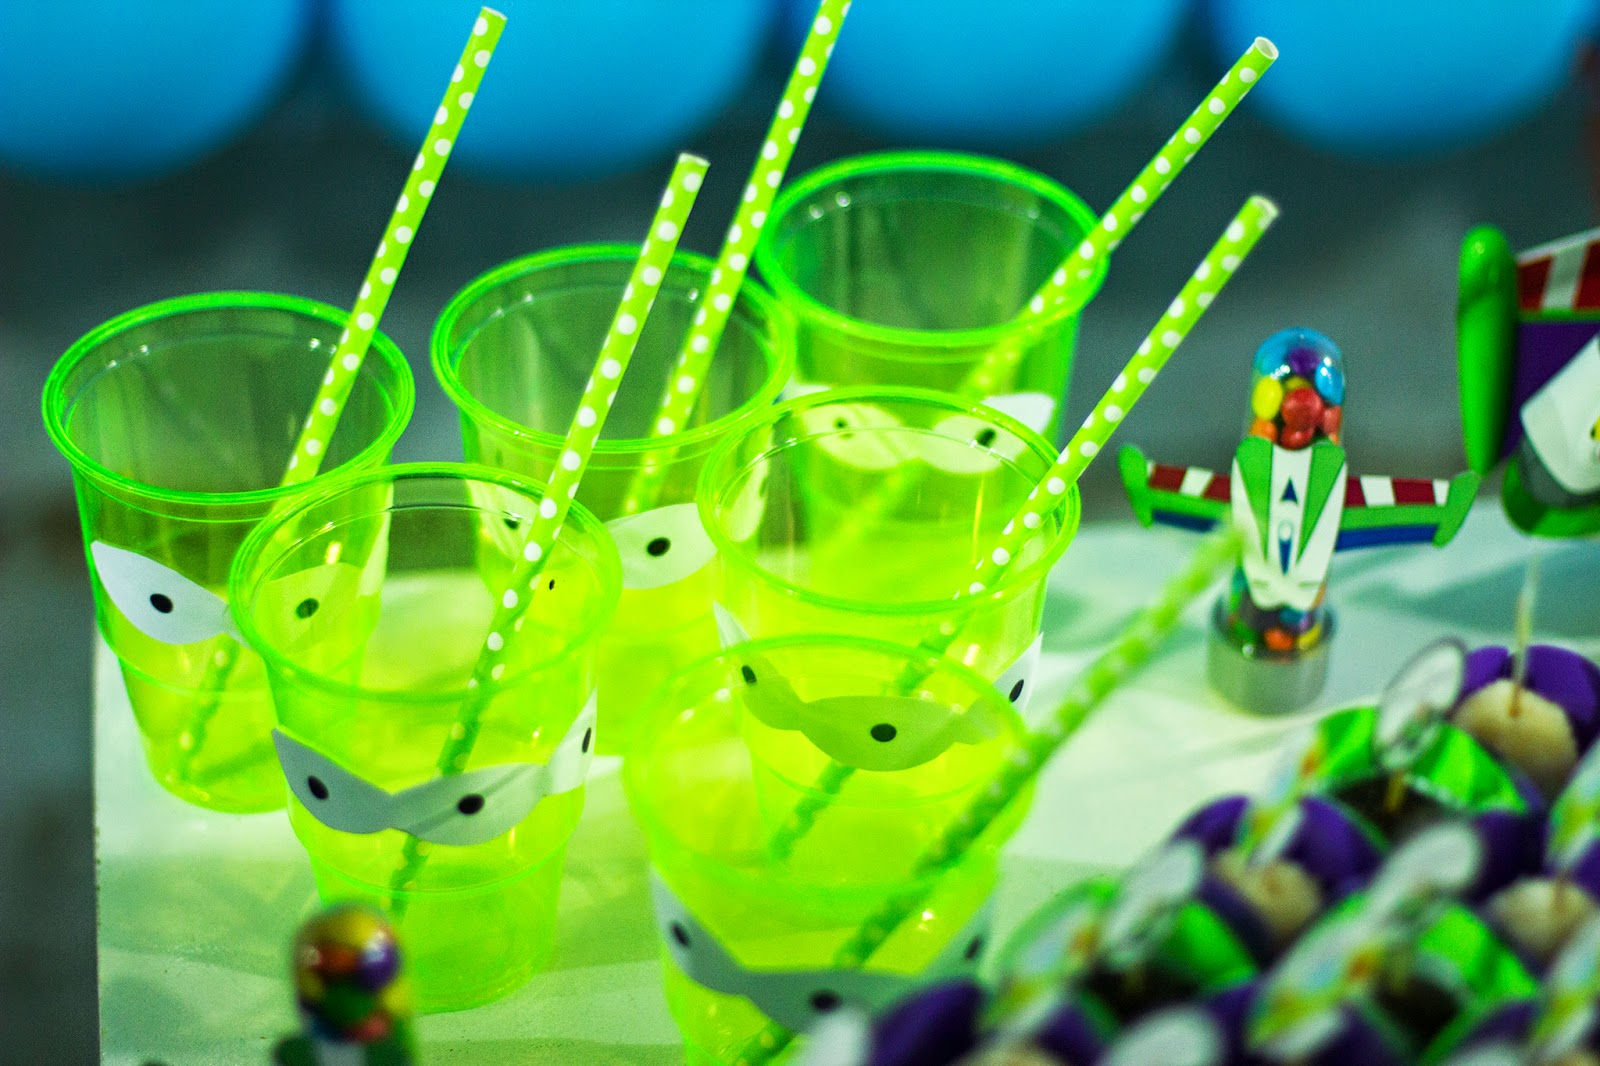 decoracao festa glow:Comprei uma base de 50 copos de plástico mesmo verde fluorescente e